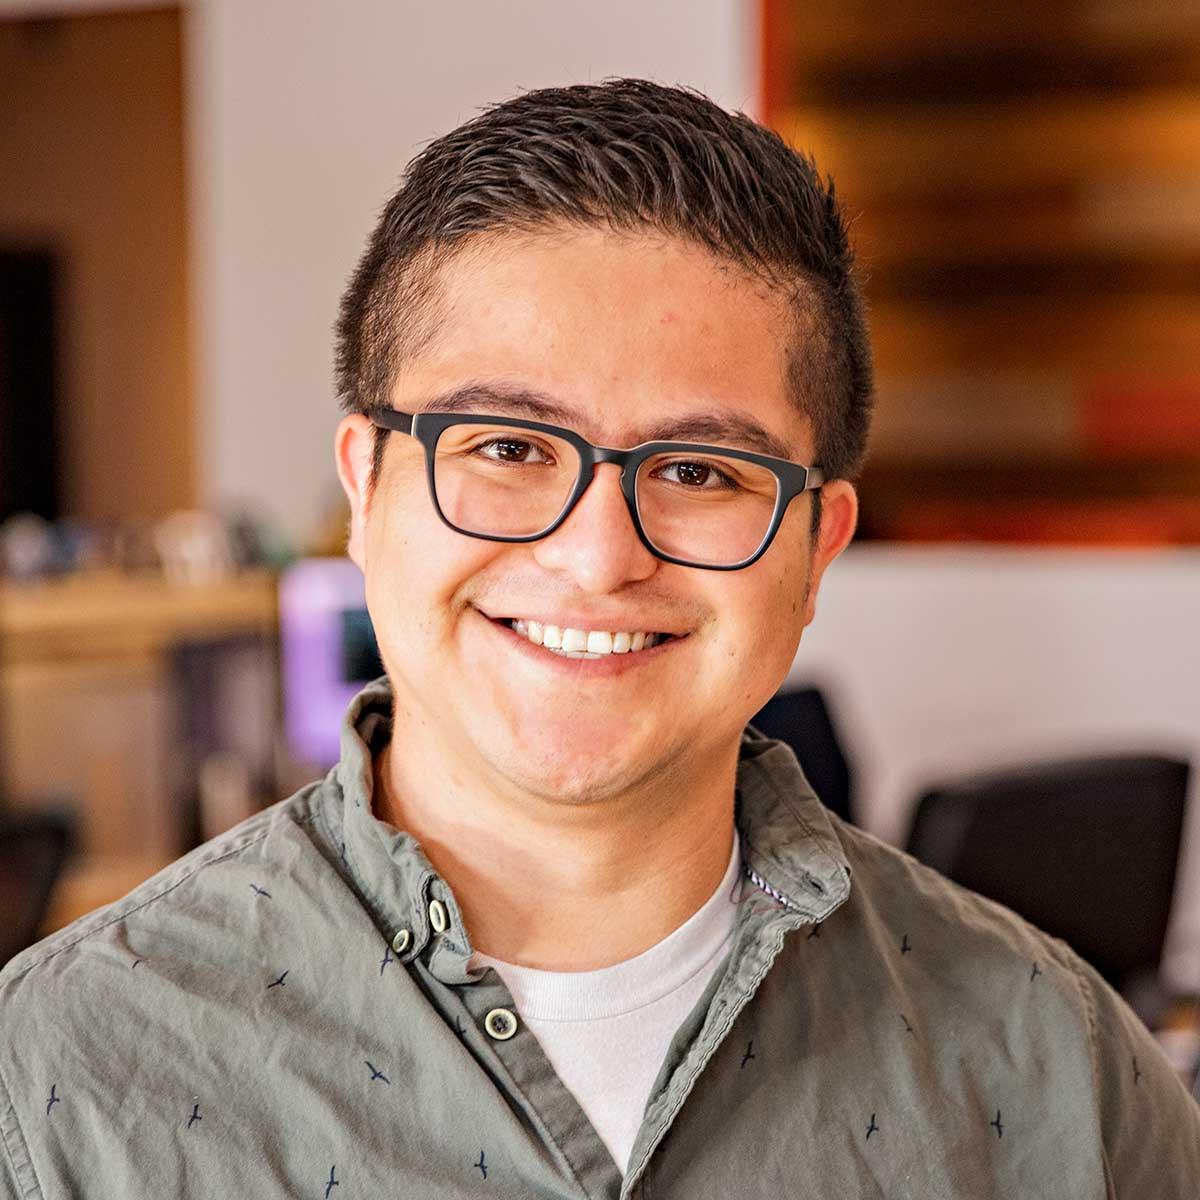 Carlos Erazo, Graphic Designer at Insight Creative Group